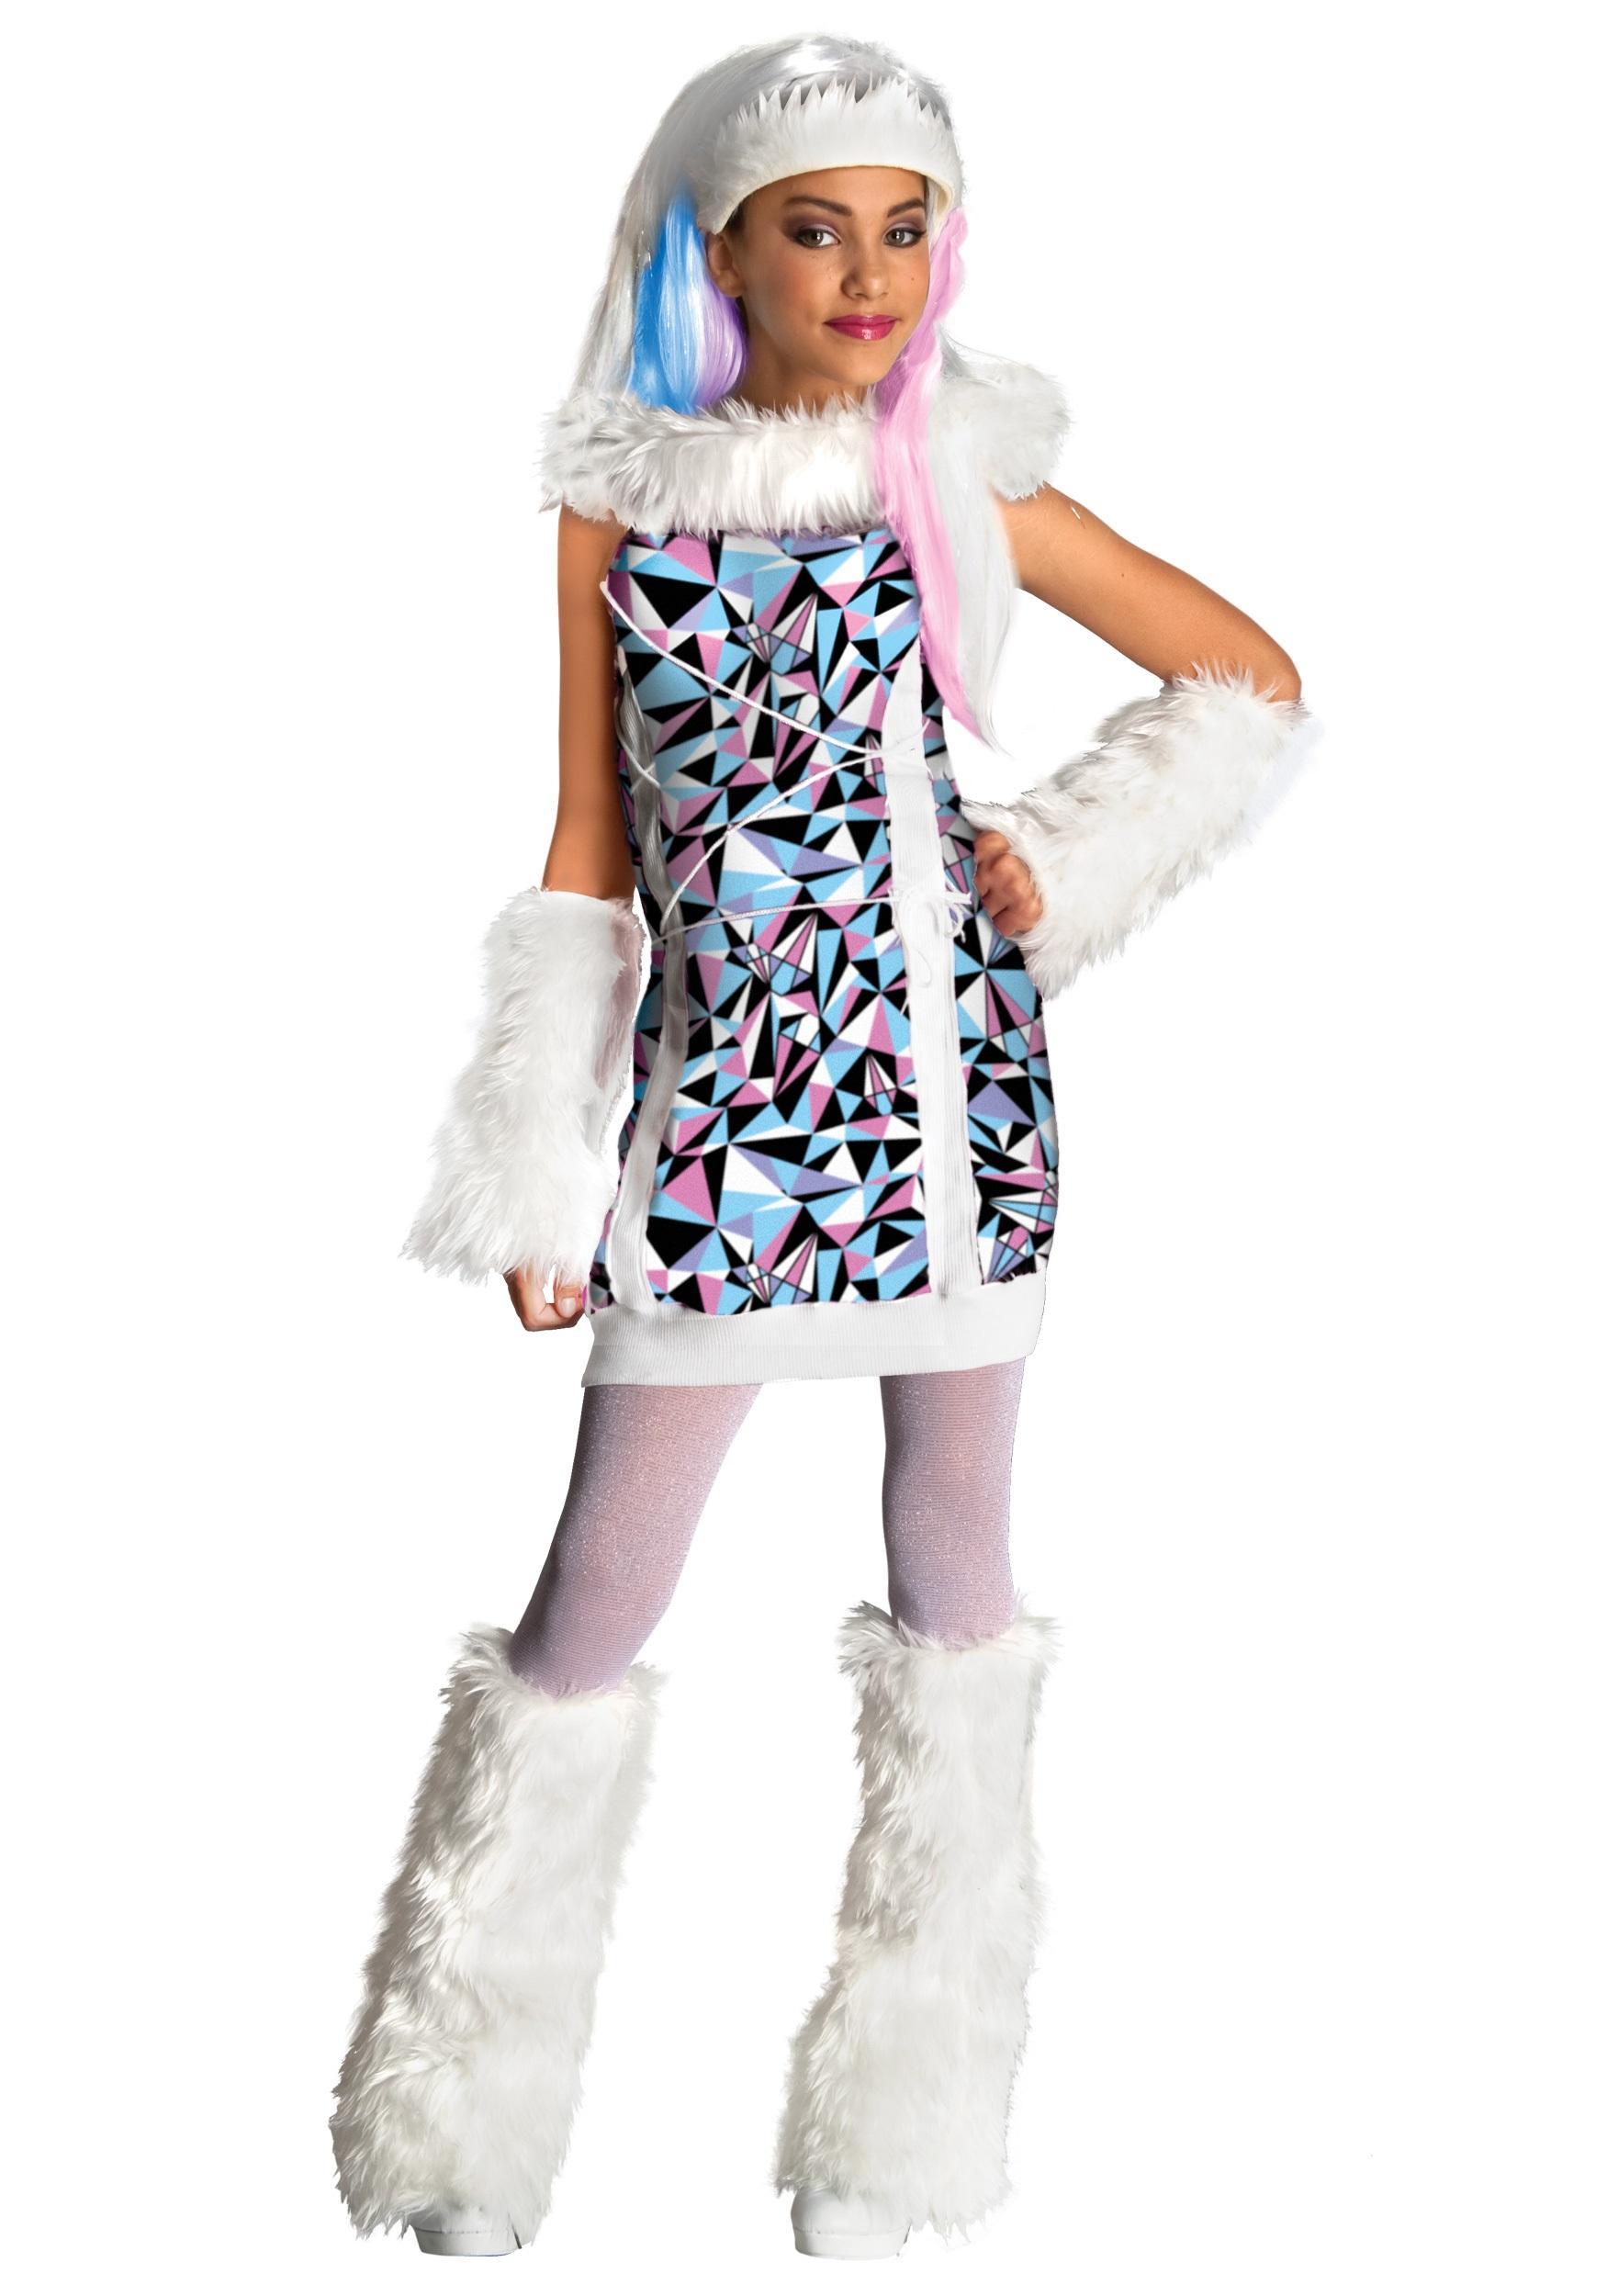 Girl's Abbey Bominable Costume RU881362